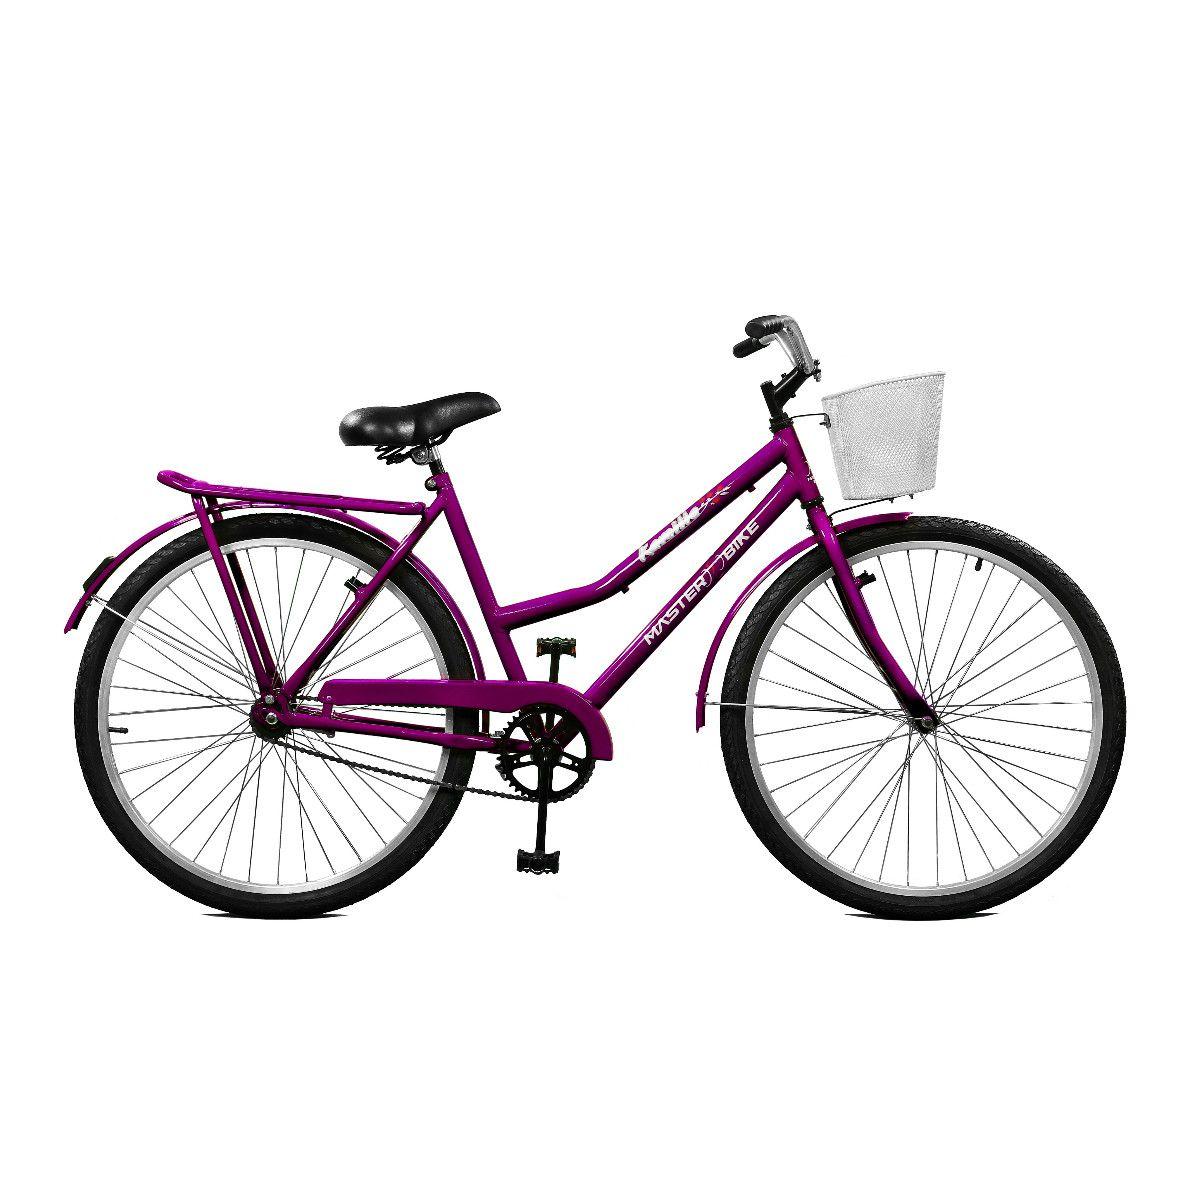 Bicicleta Master Bike Aro 26 Kamilla Contrapedal c/ Cesta Violeta